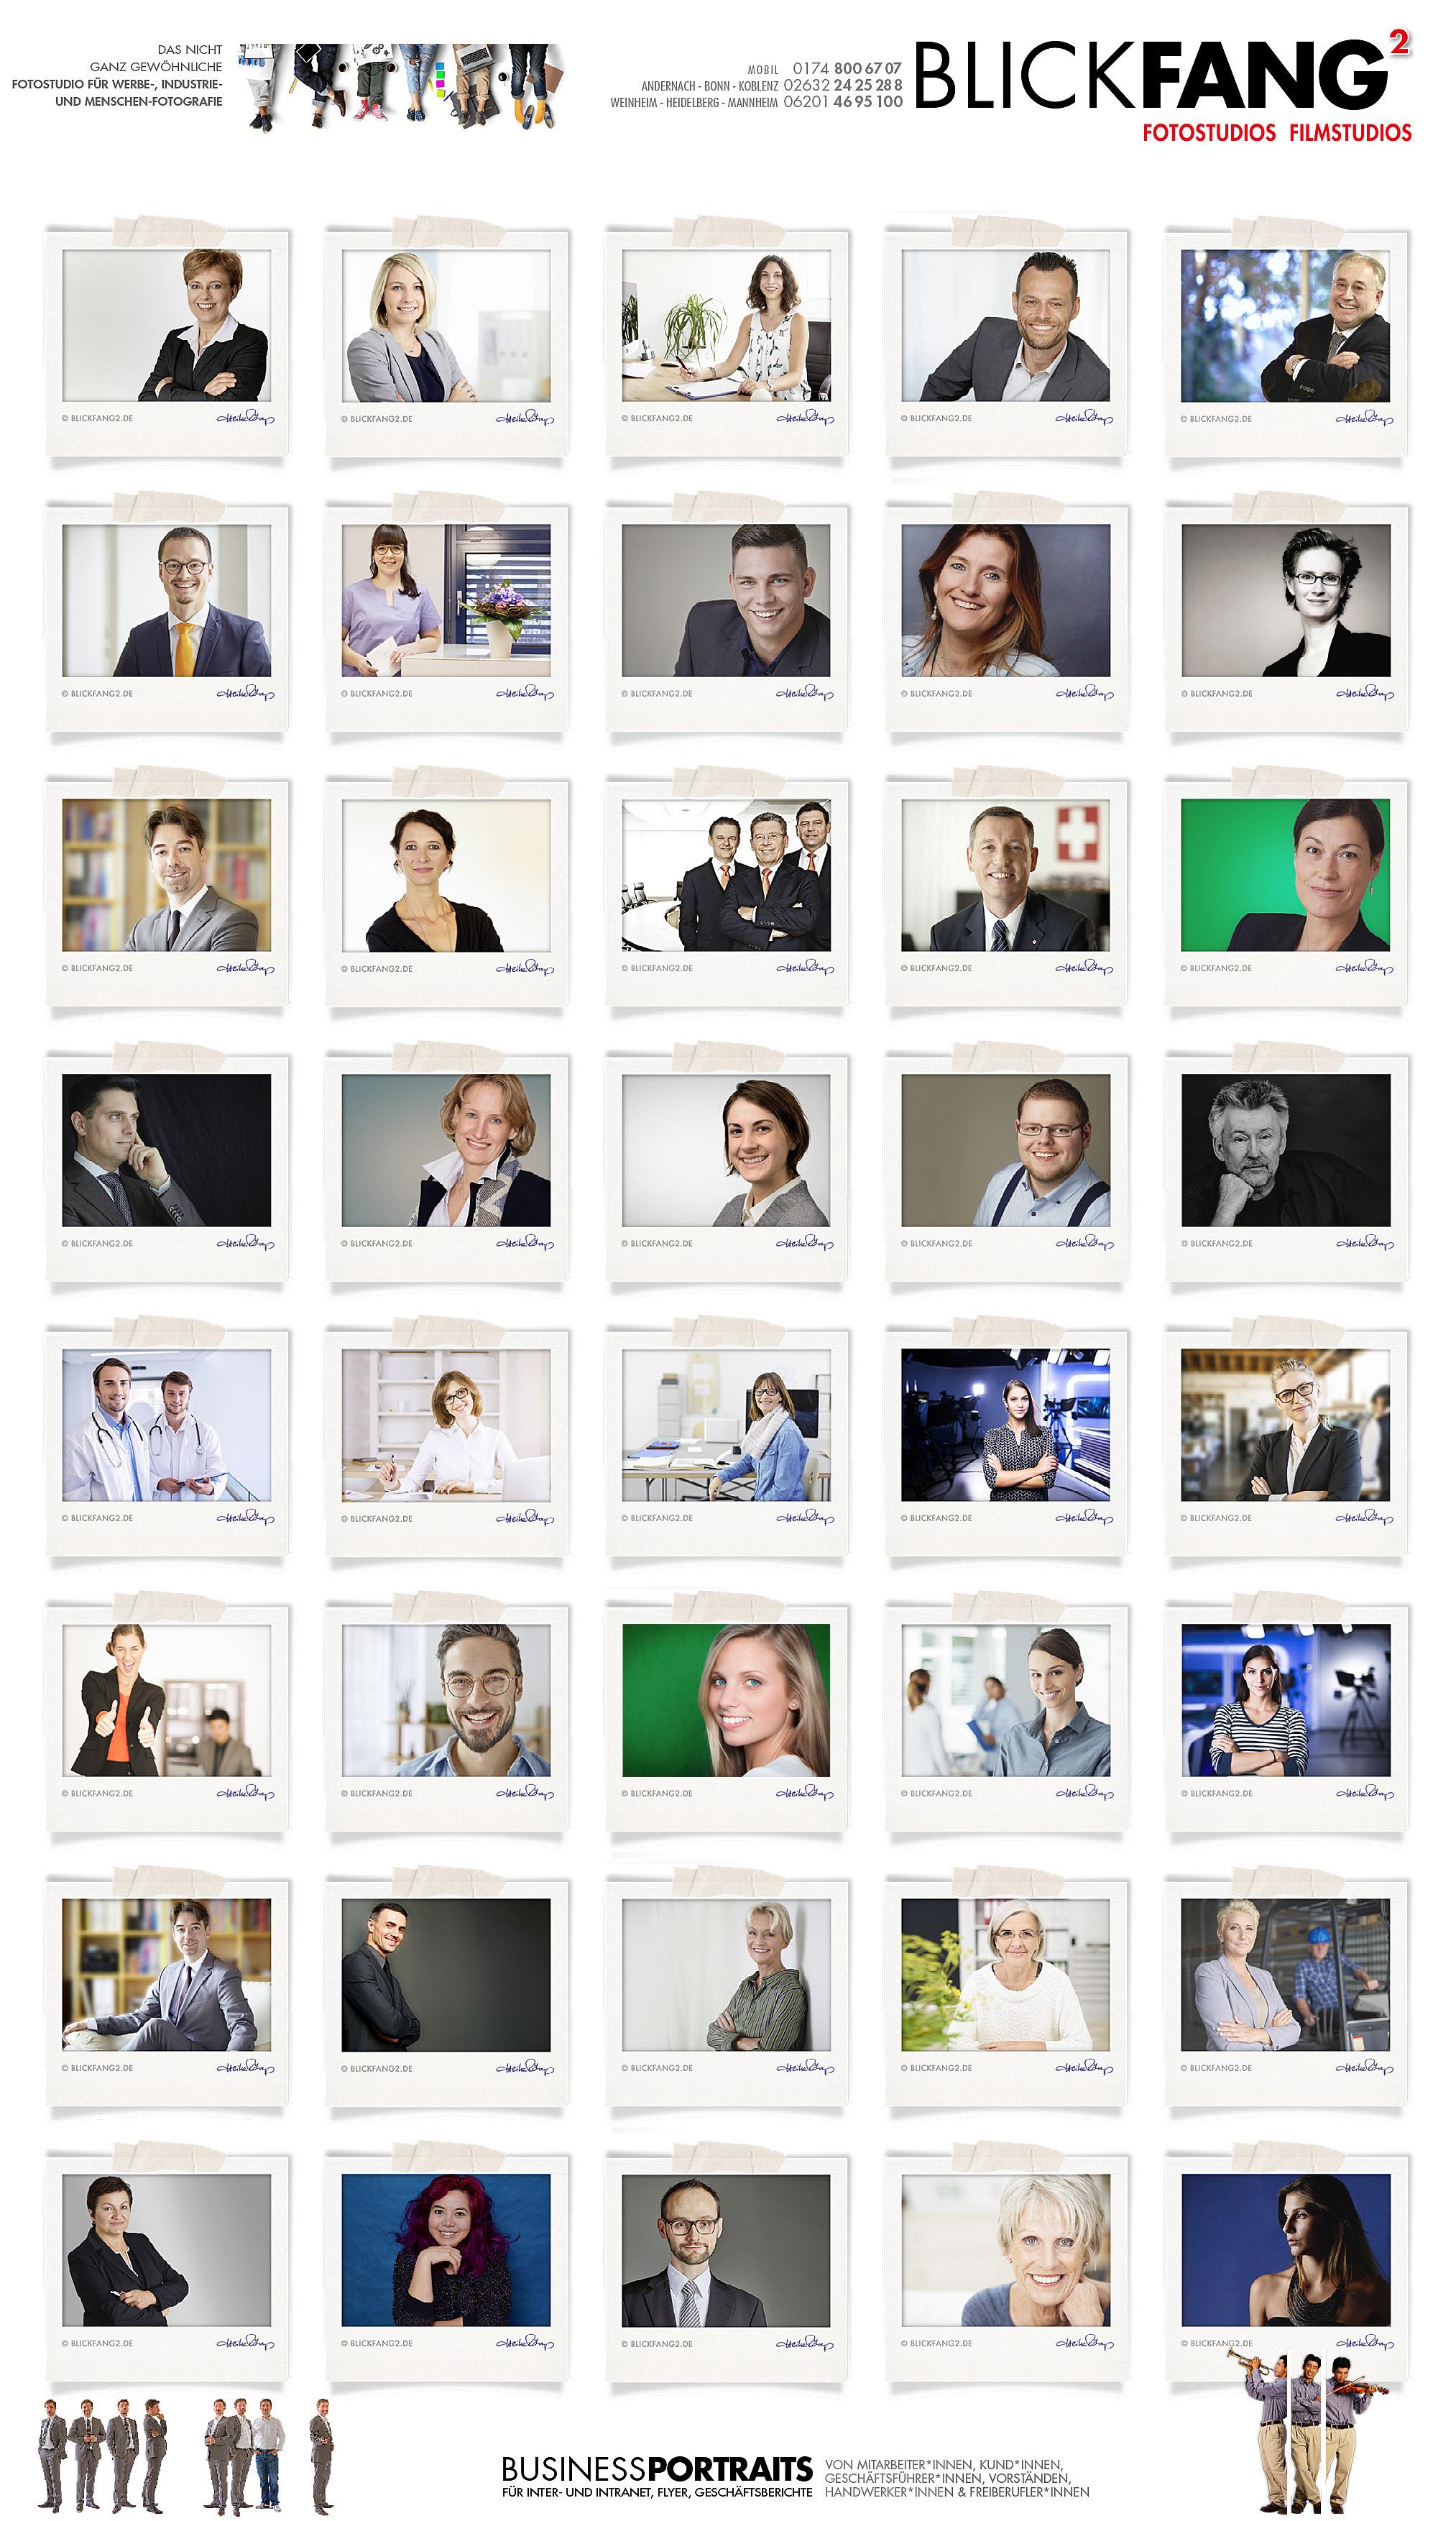 Portraitfoto, Bewerbungsfoto, Aktfoto, Industriefoto, Produktfoto @ BlickFang2 Fotostudio, Filmstudio in Weinheim und Andernach, Fotograf